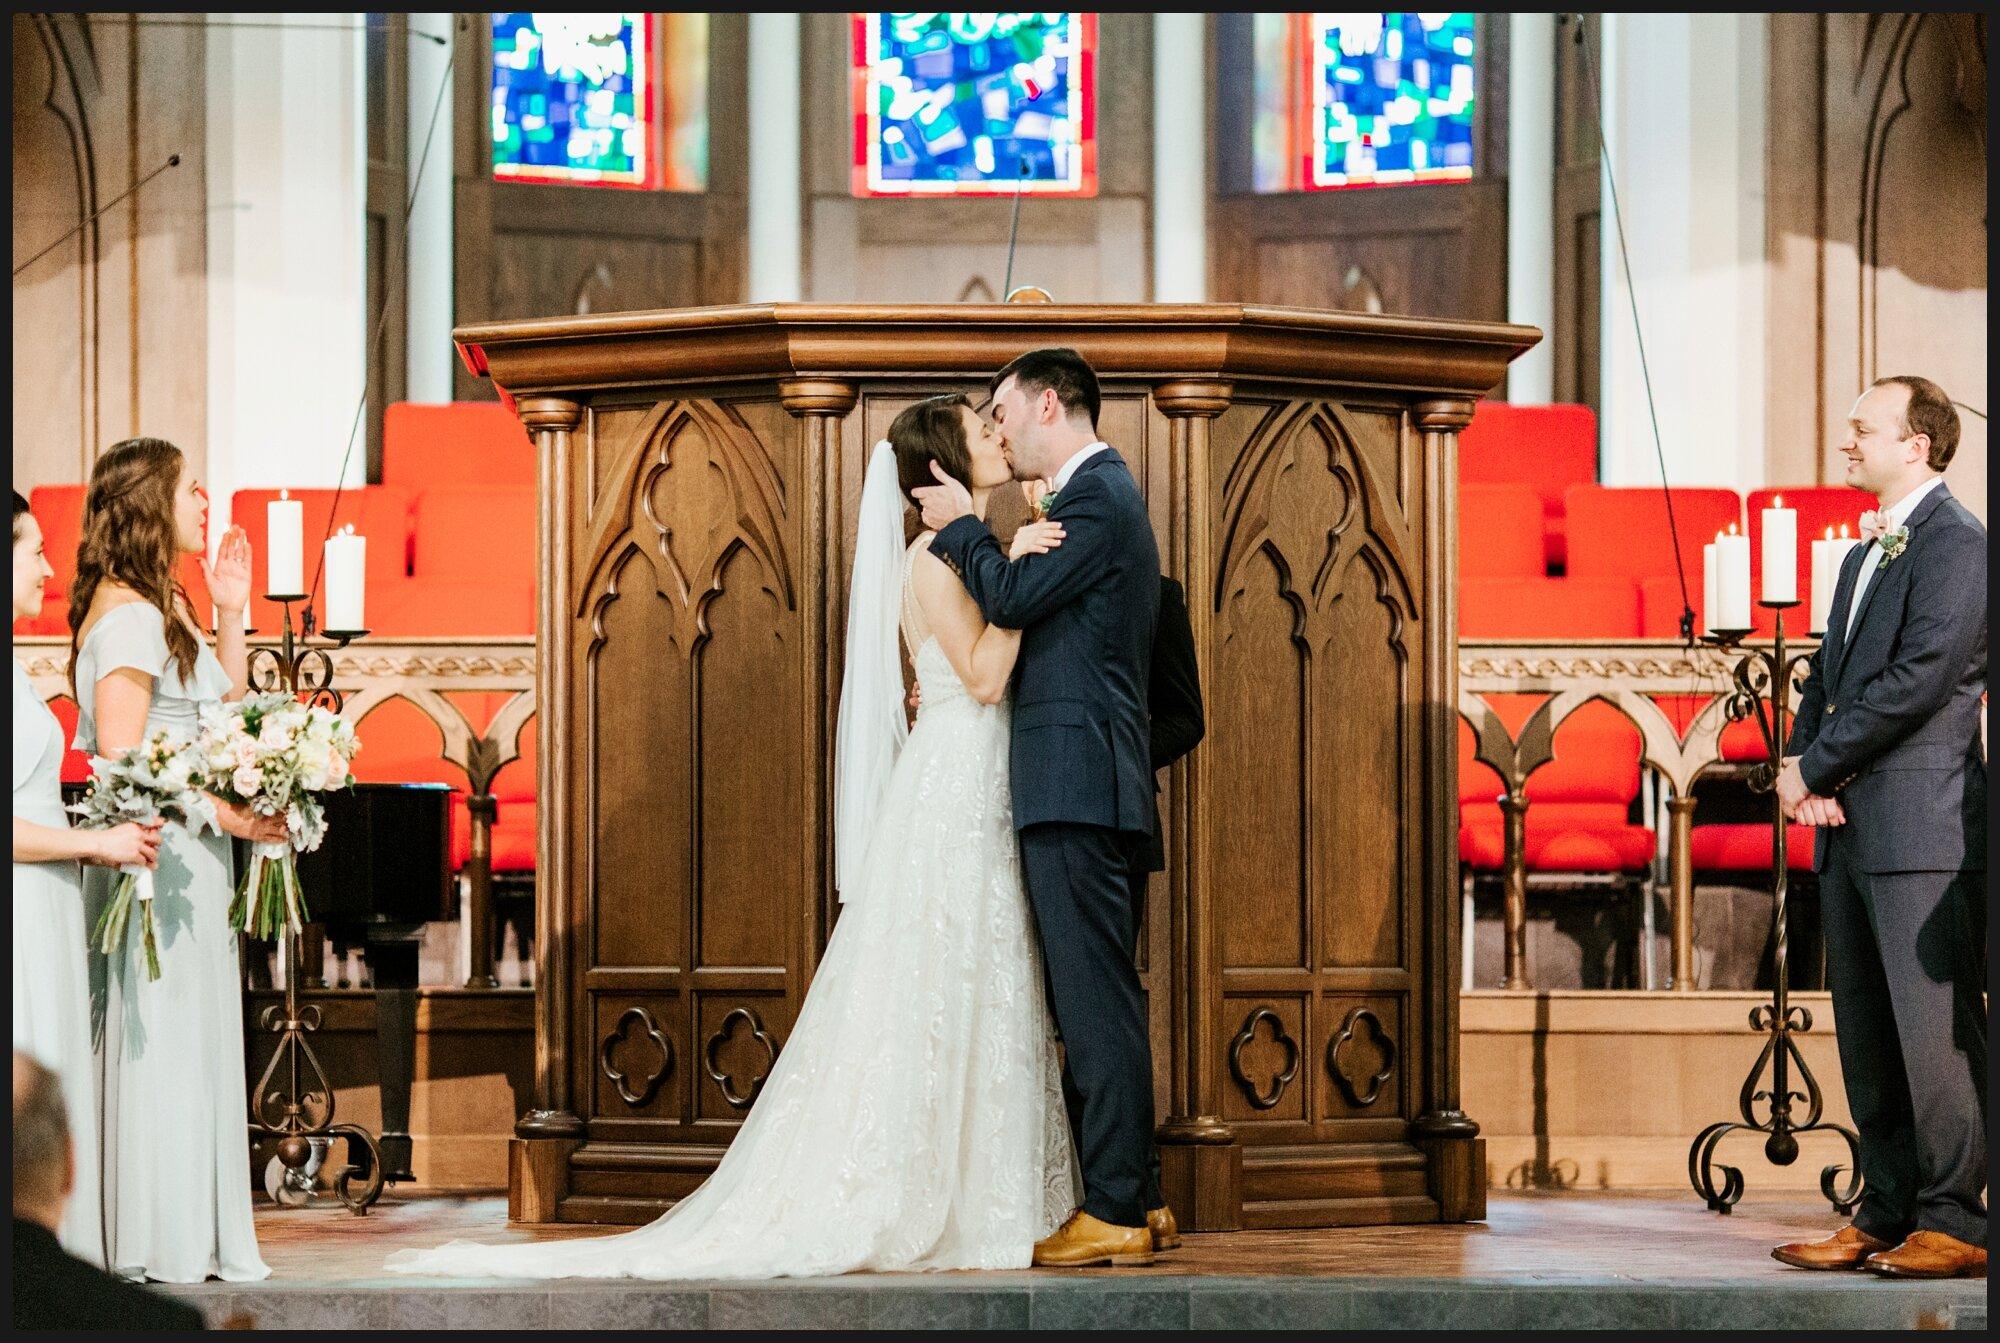 Orlando-Wedding-Photographer-destination-wedding-photographer-florida-wedding-photographer-hawaii-wedding-photographer_0681.jpg